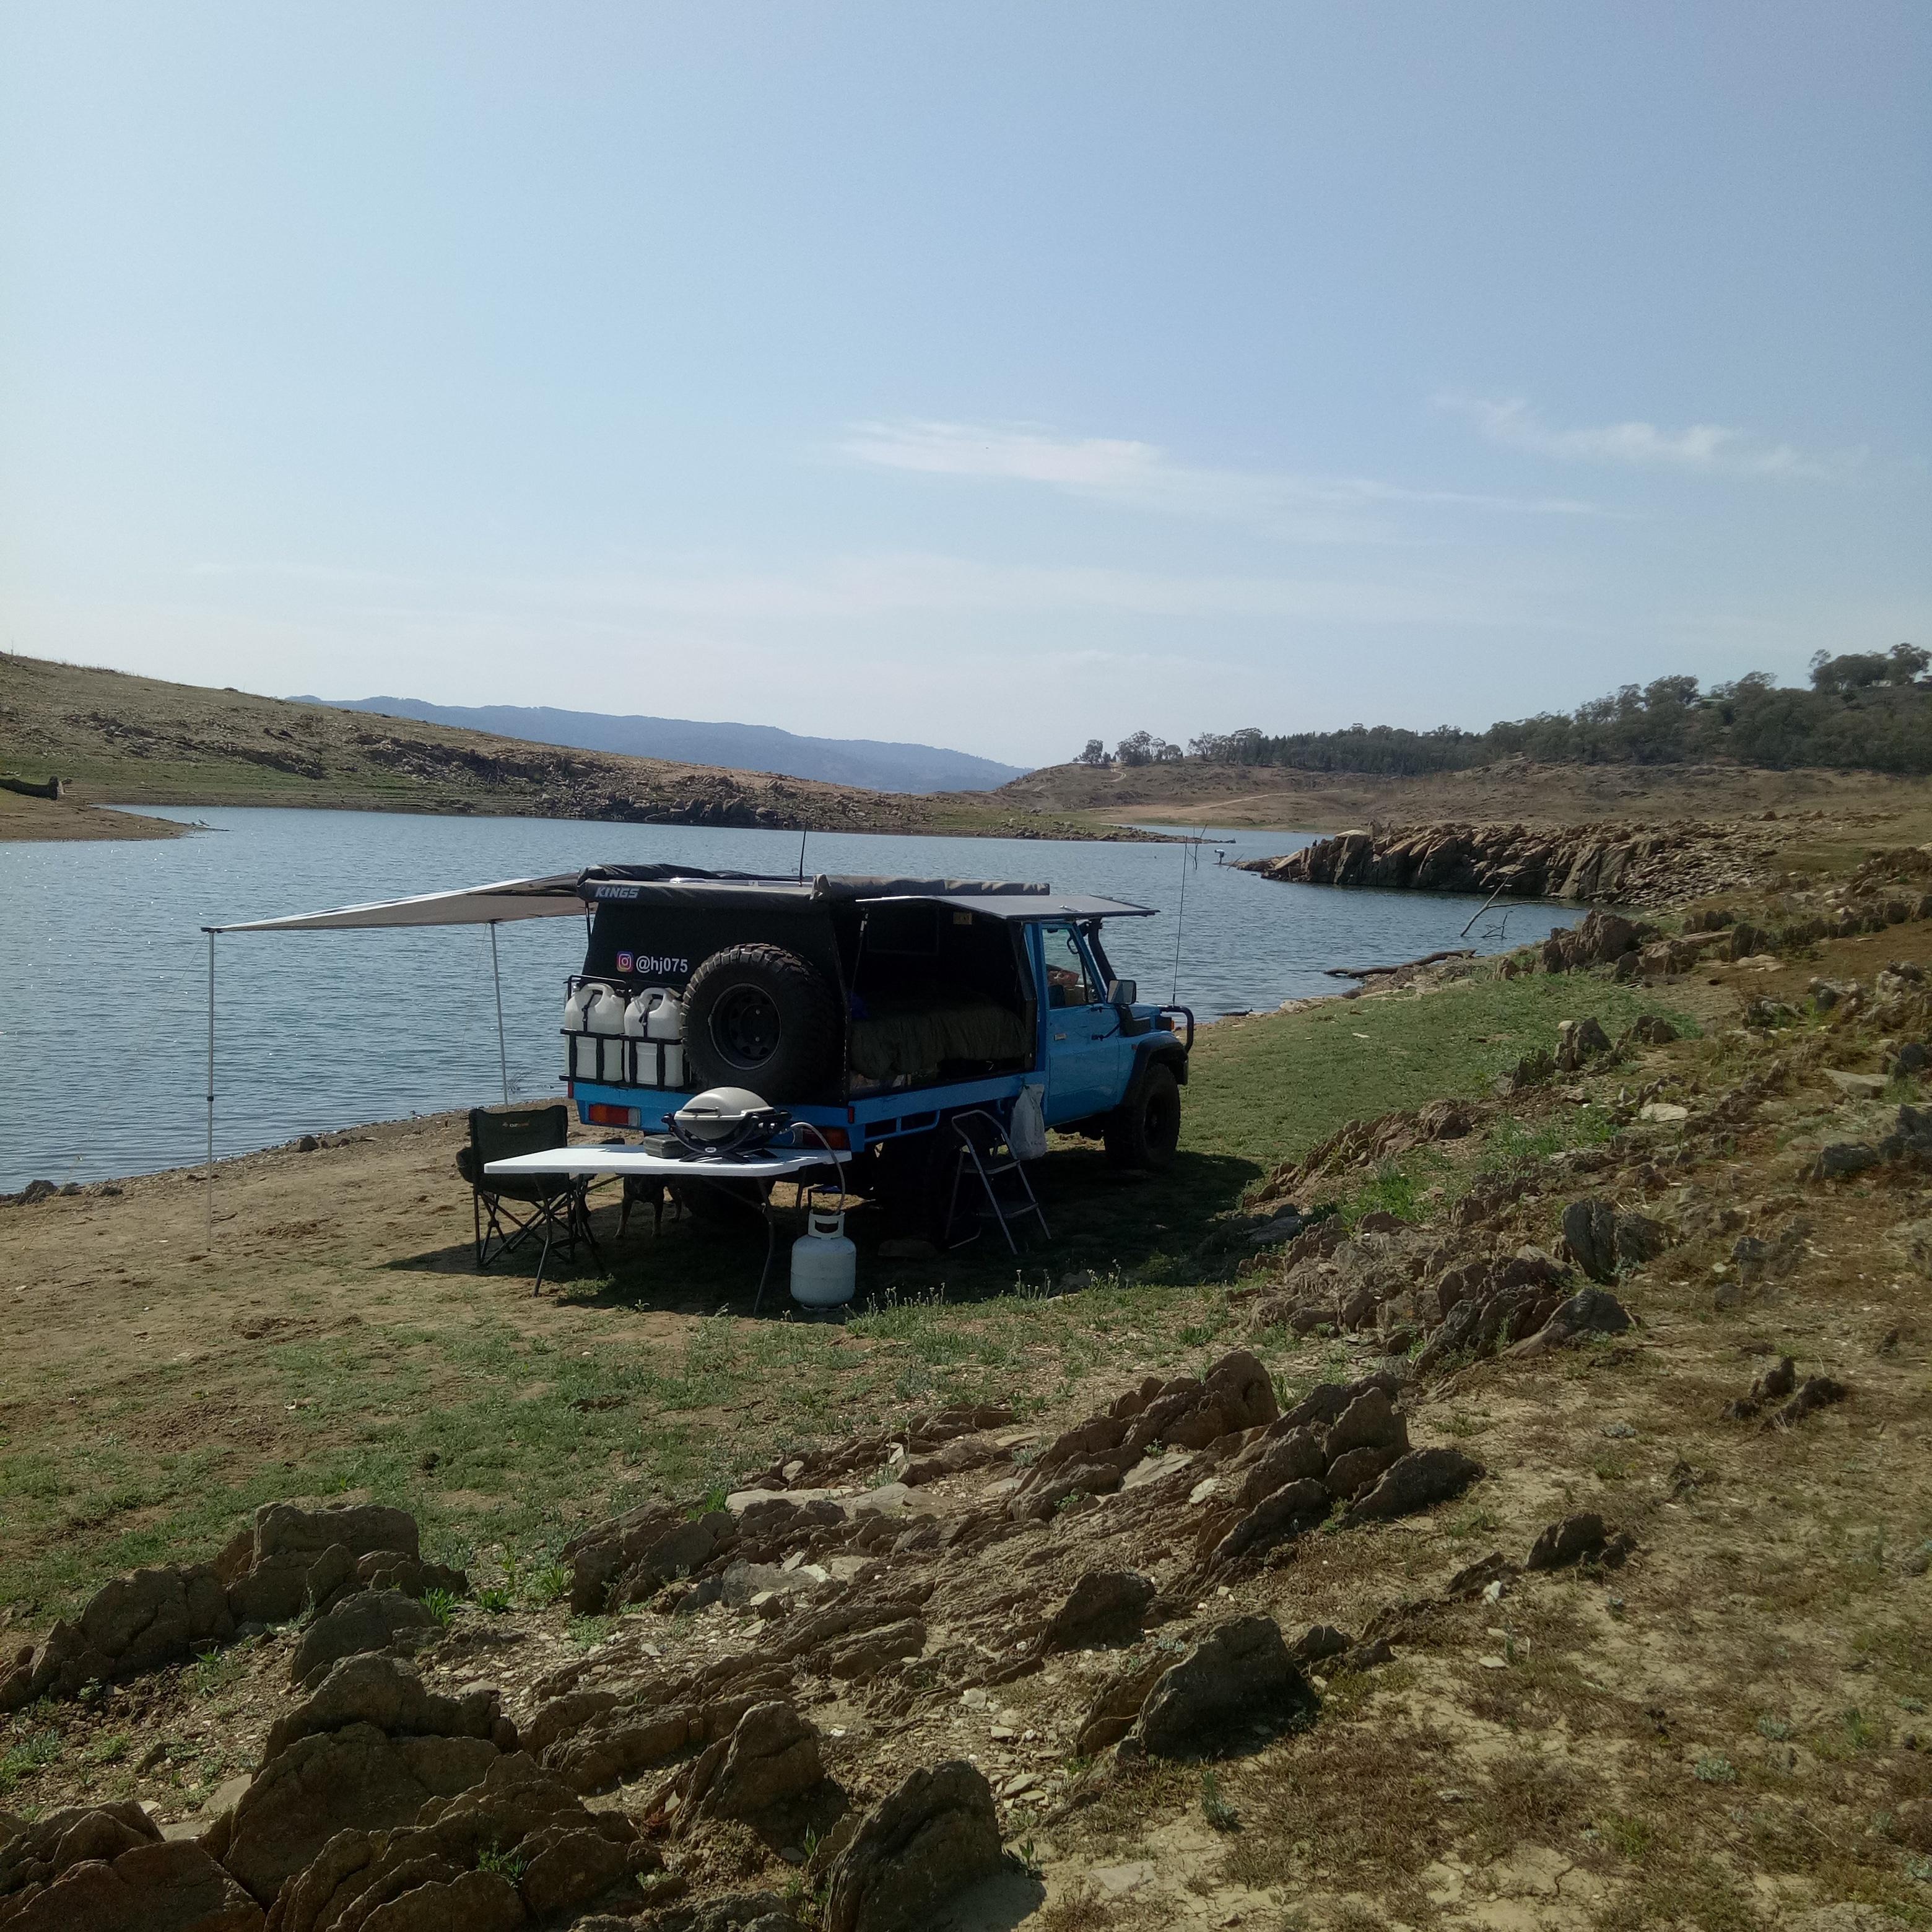 burrendong dam 6,10,19 249.jpg